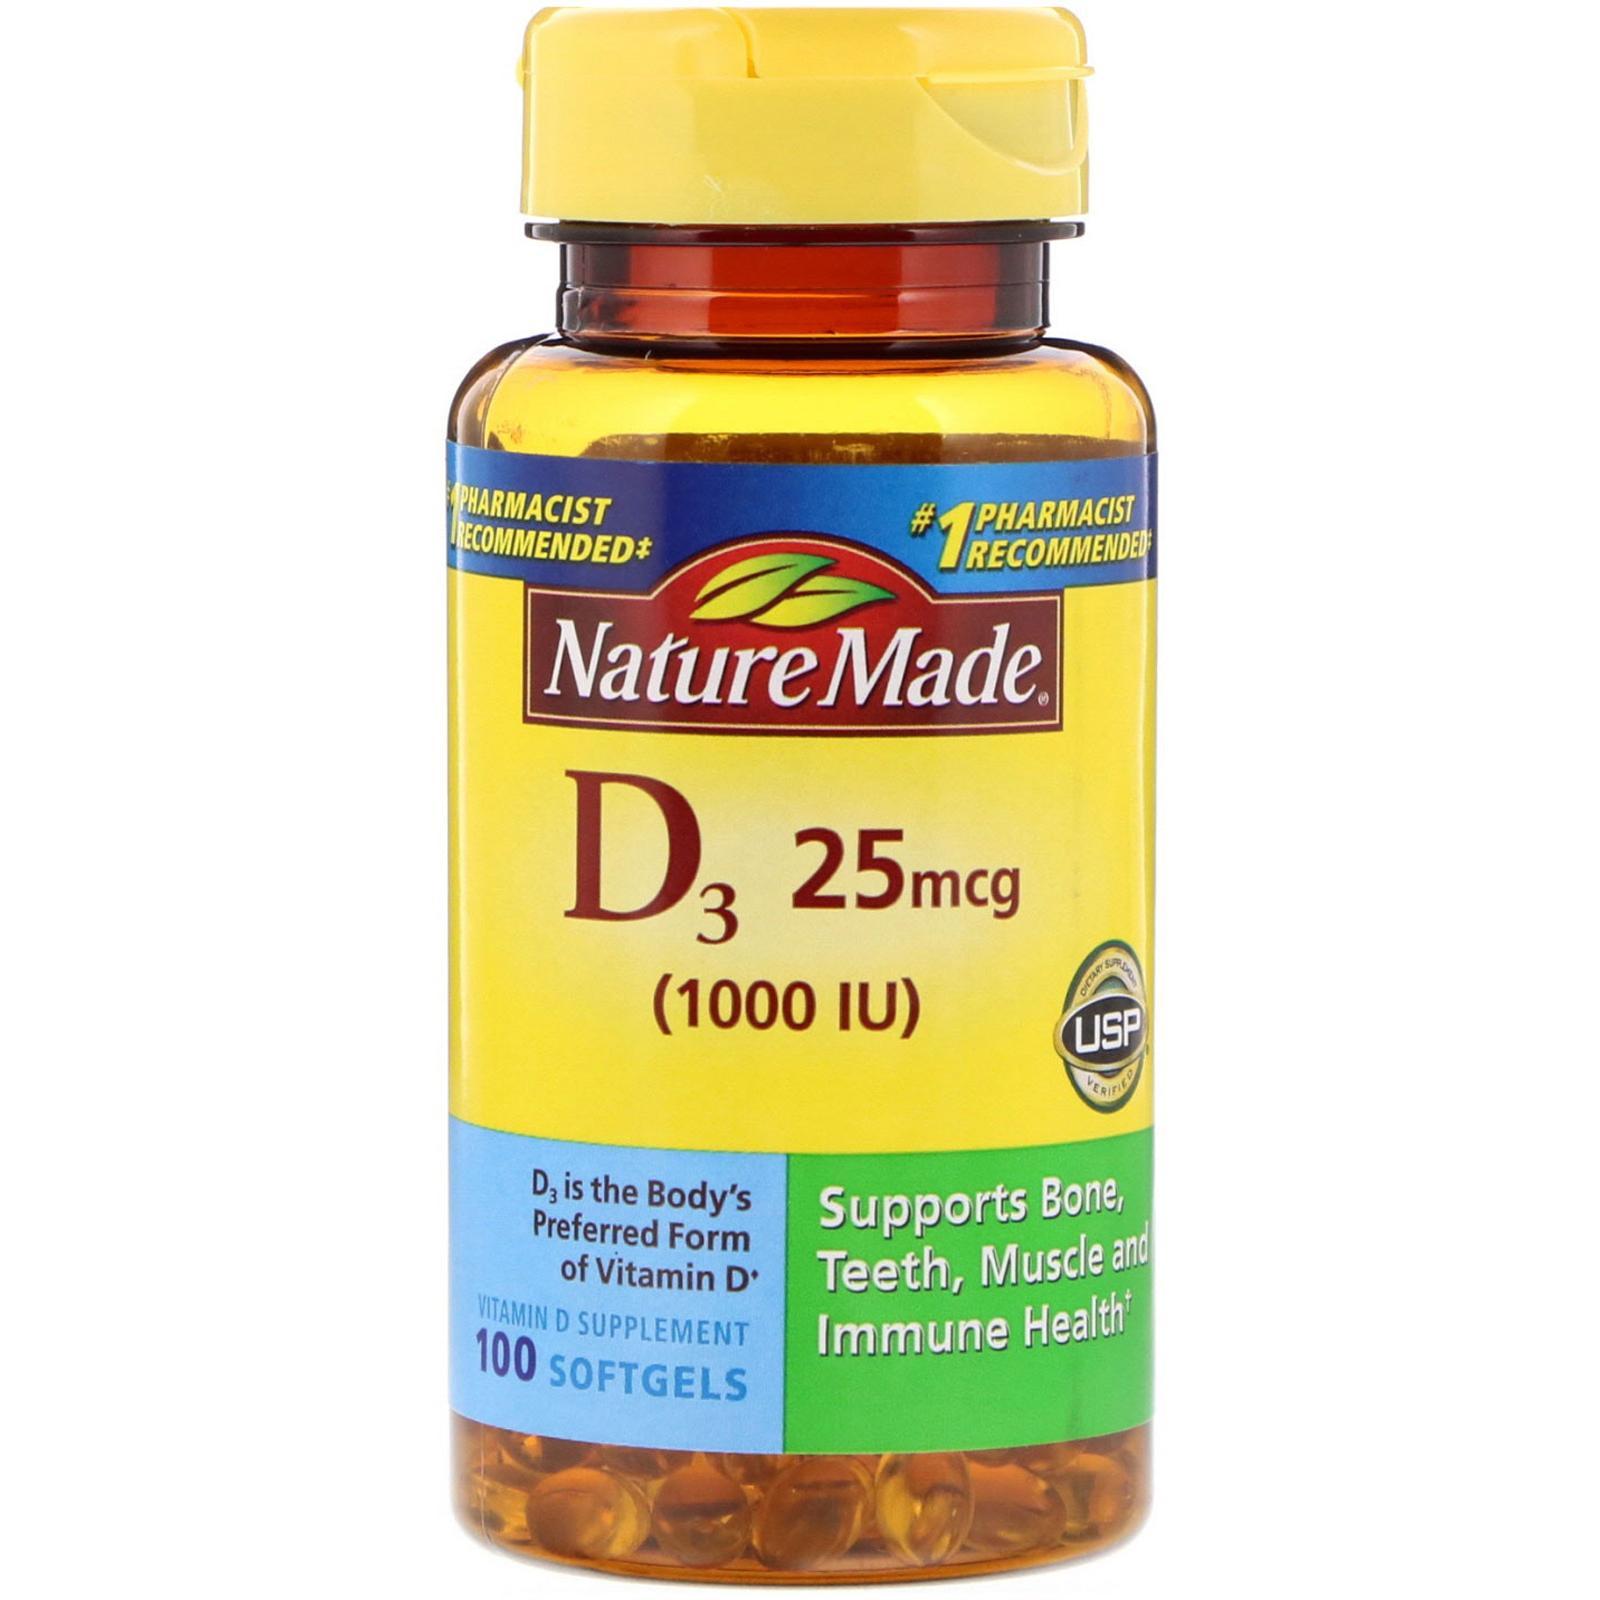 Nature Made D3